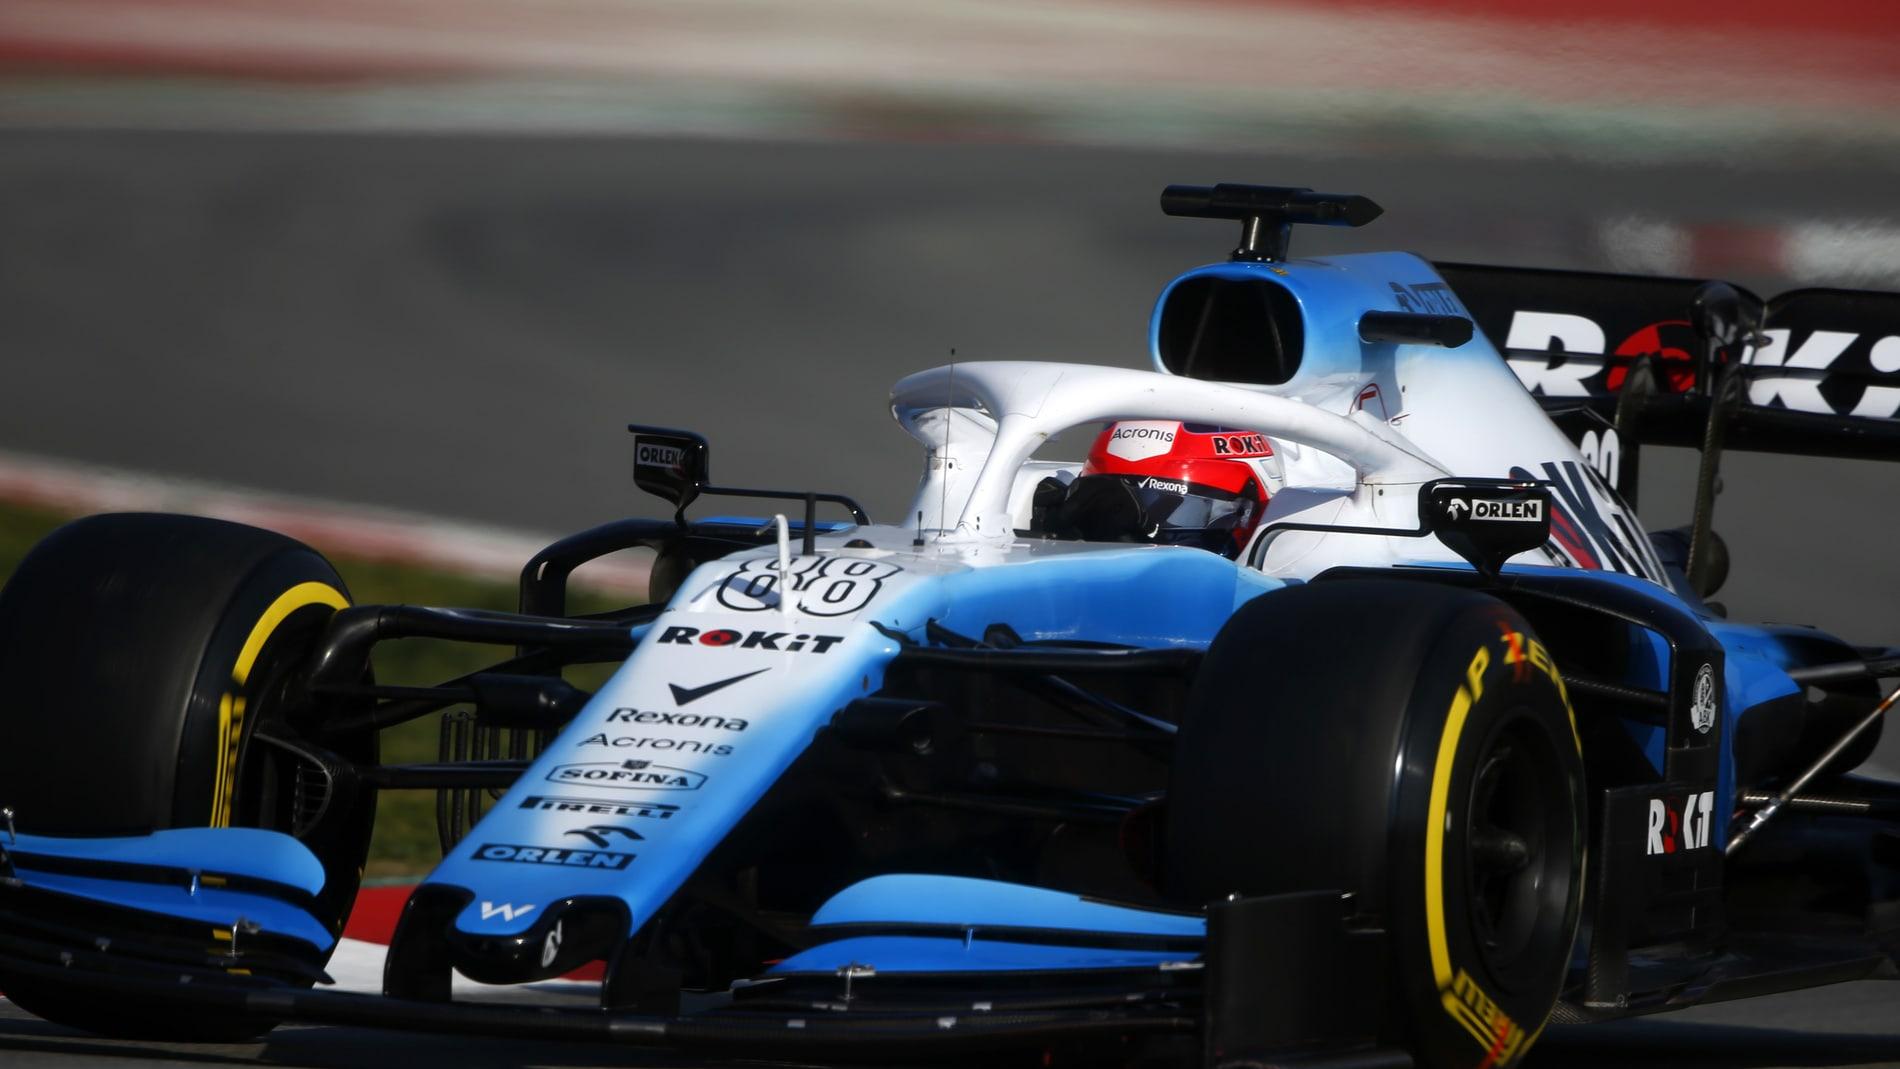 Williams modify F1 car design ahead of Australian Grand Prix